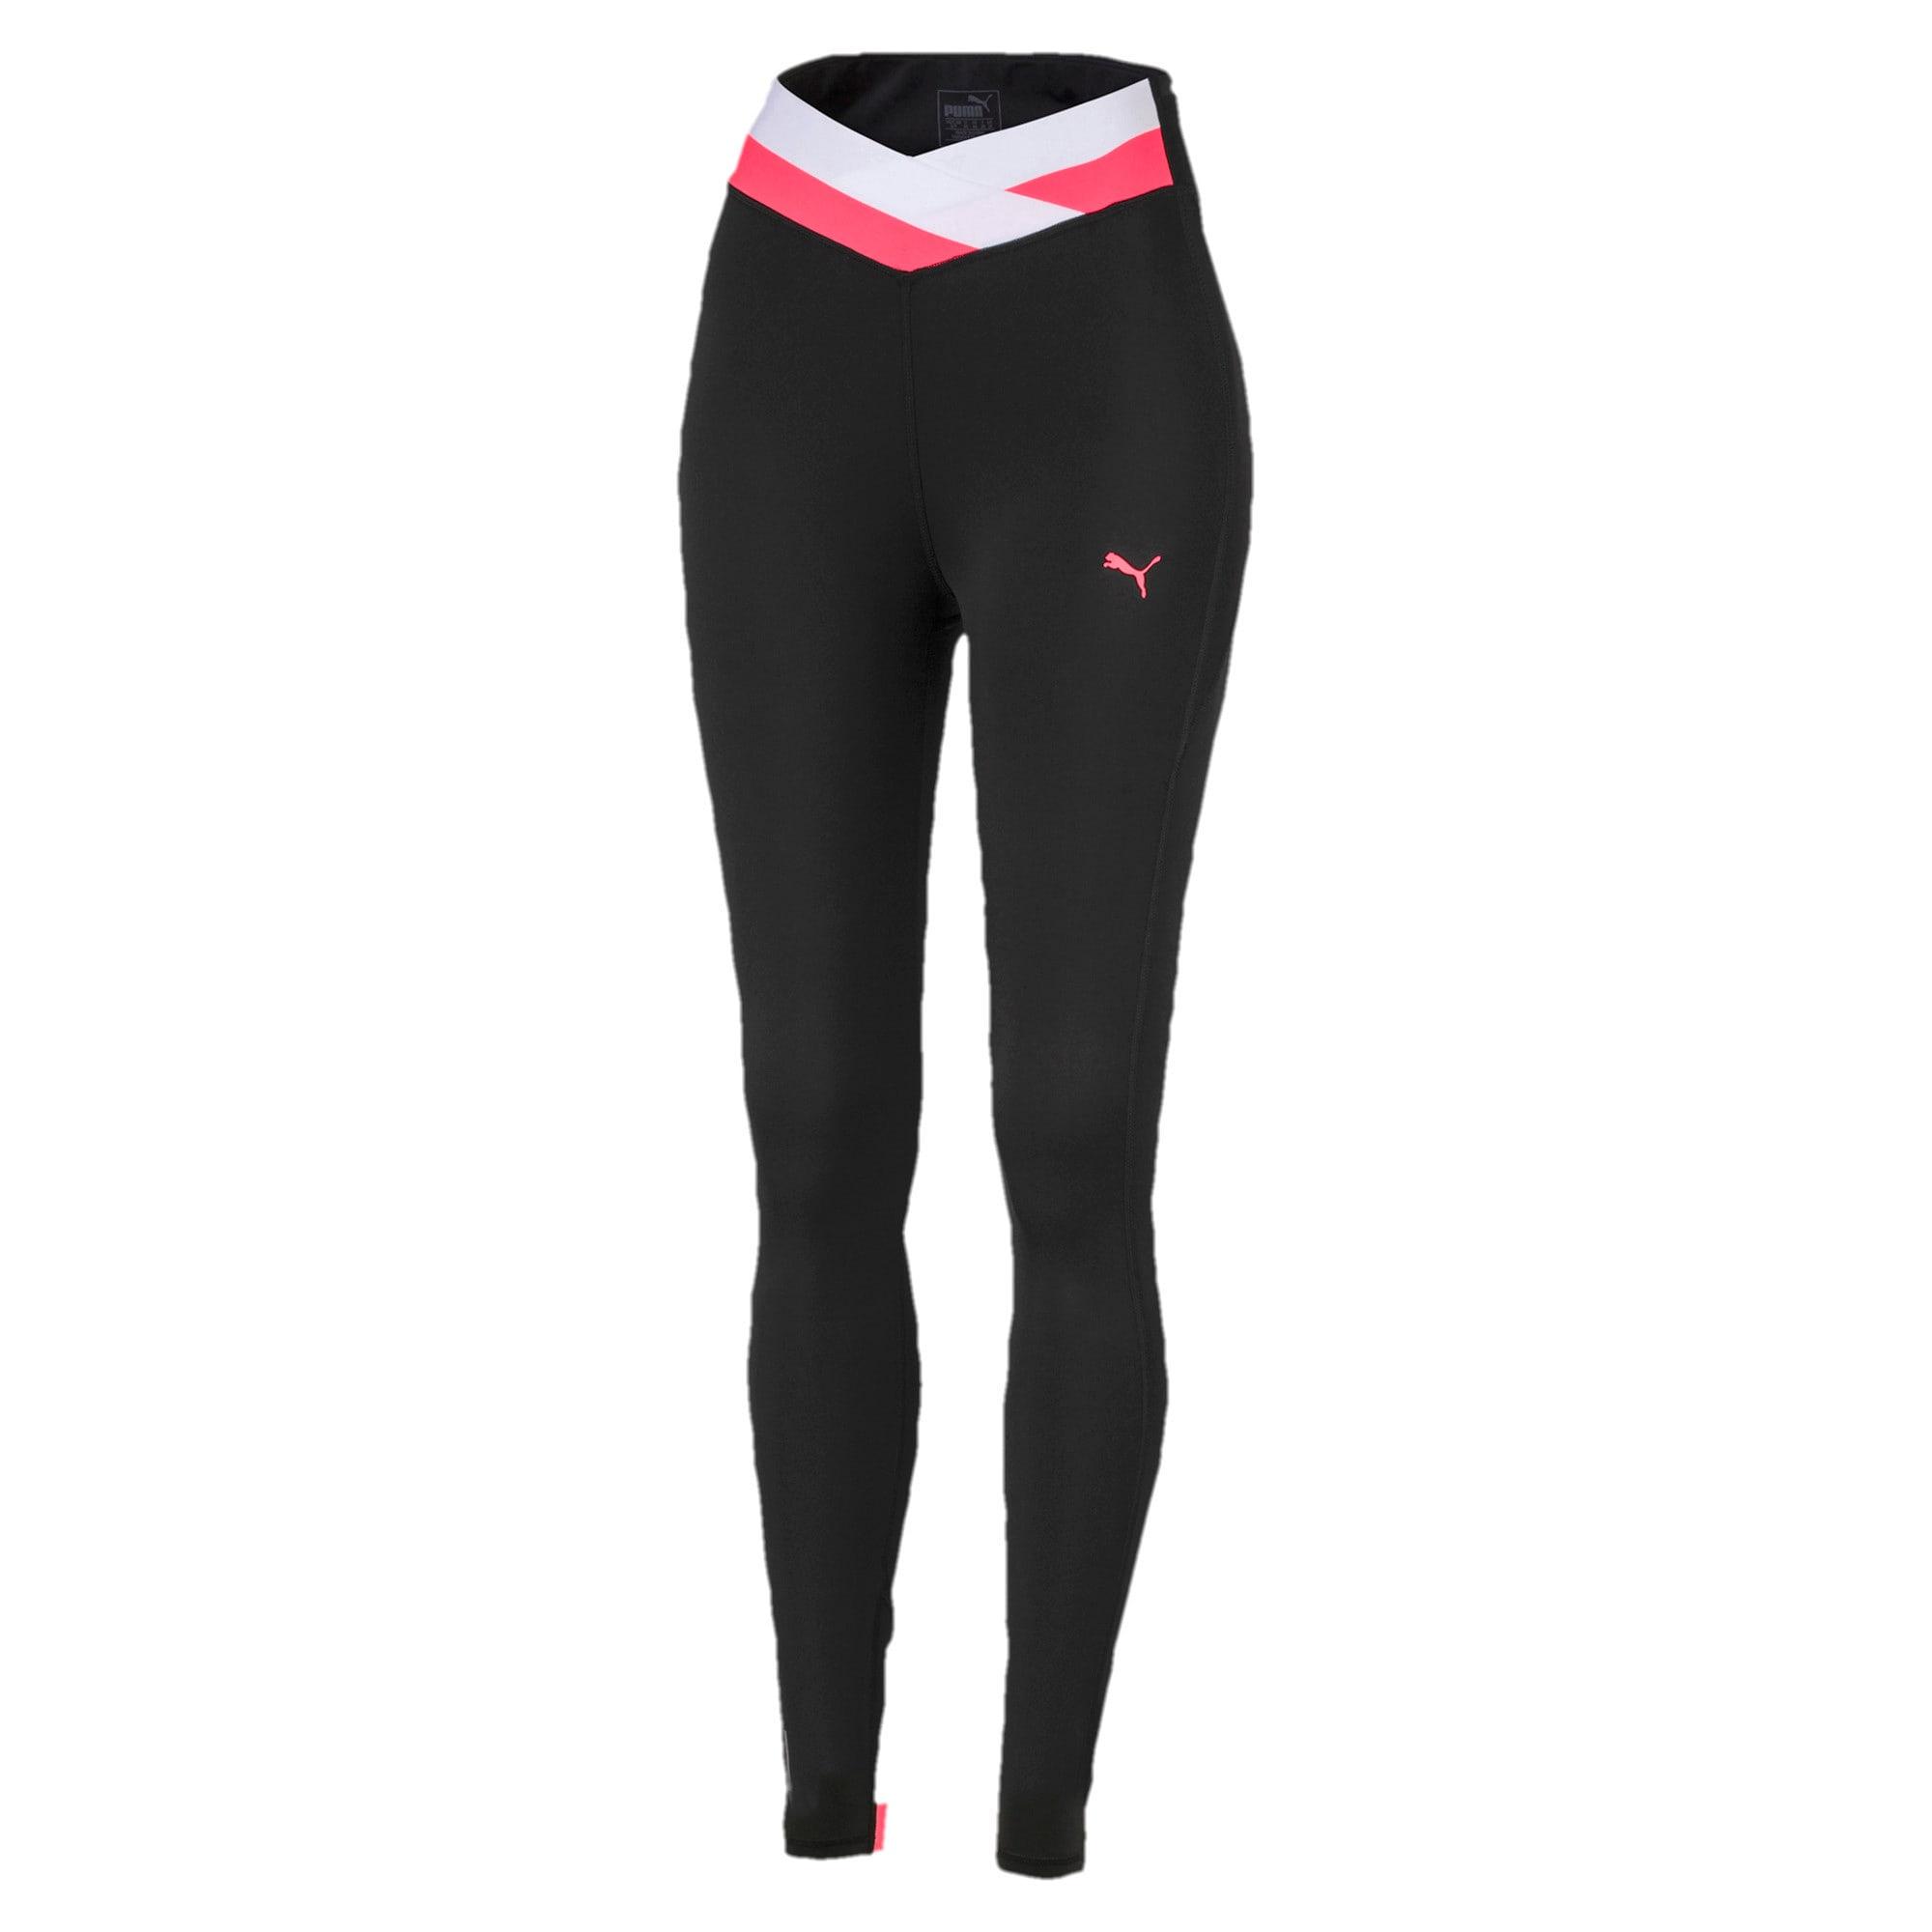 Thumbnail 4 of HIT Feel It 7/8 Women's Training Leggings, Puma Black-Pink Alert, medium-IND